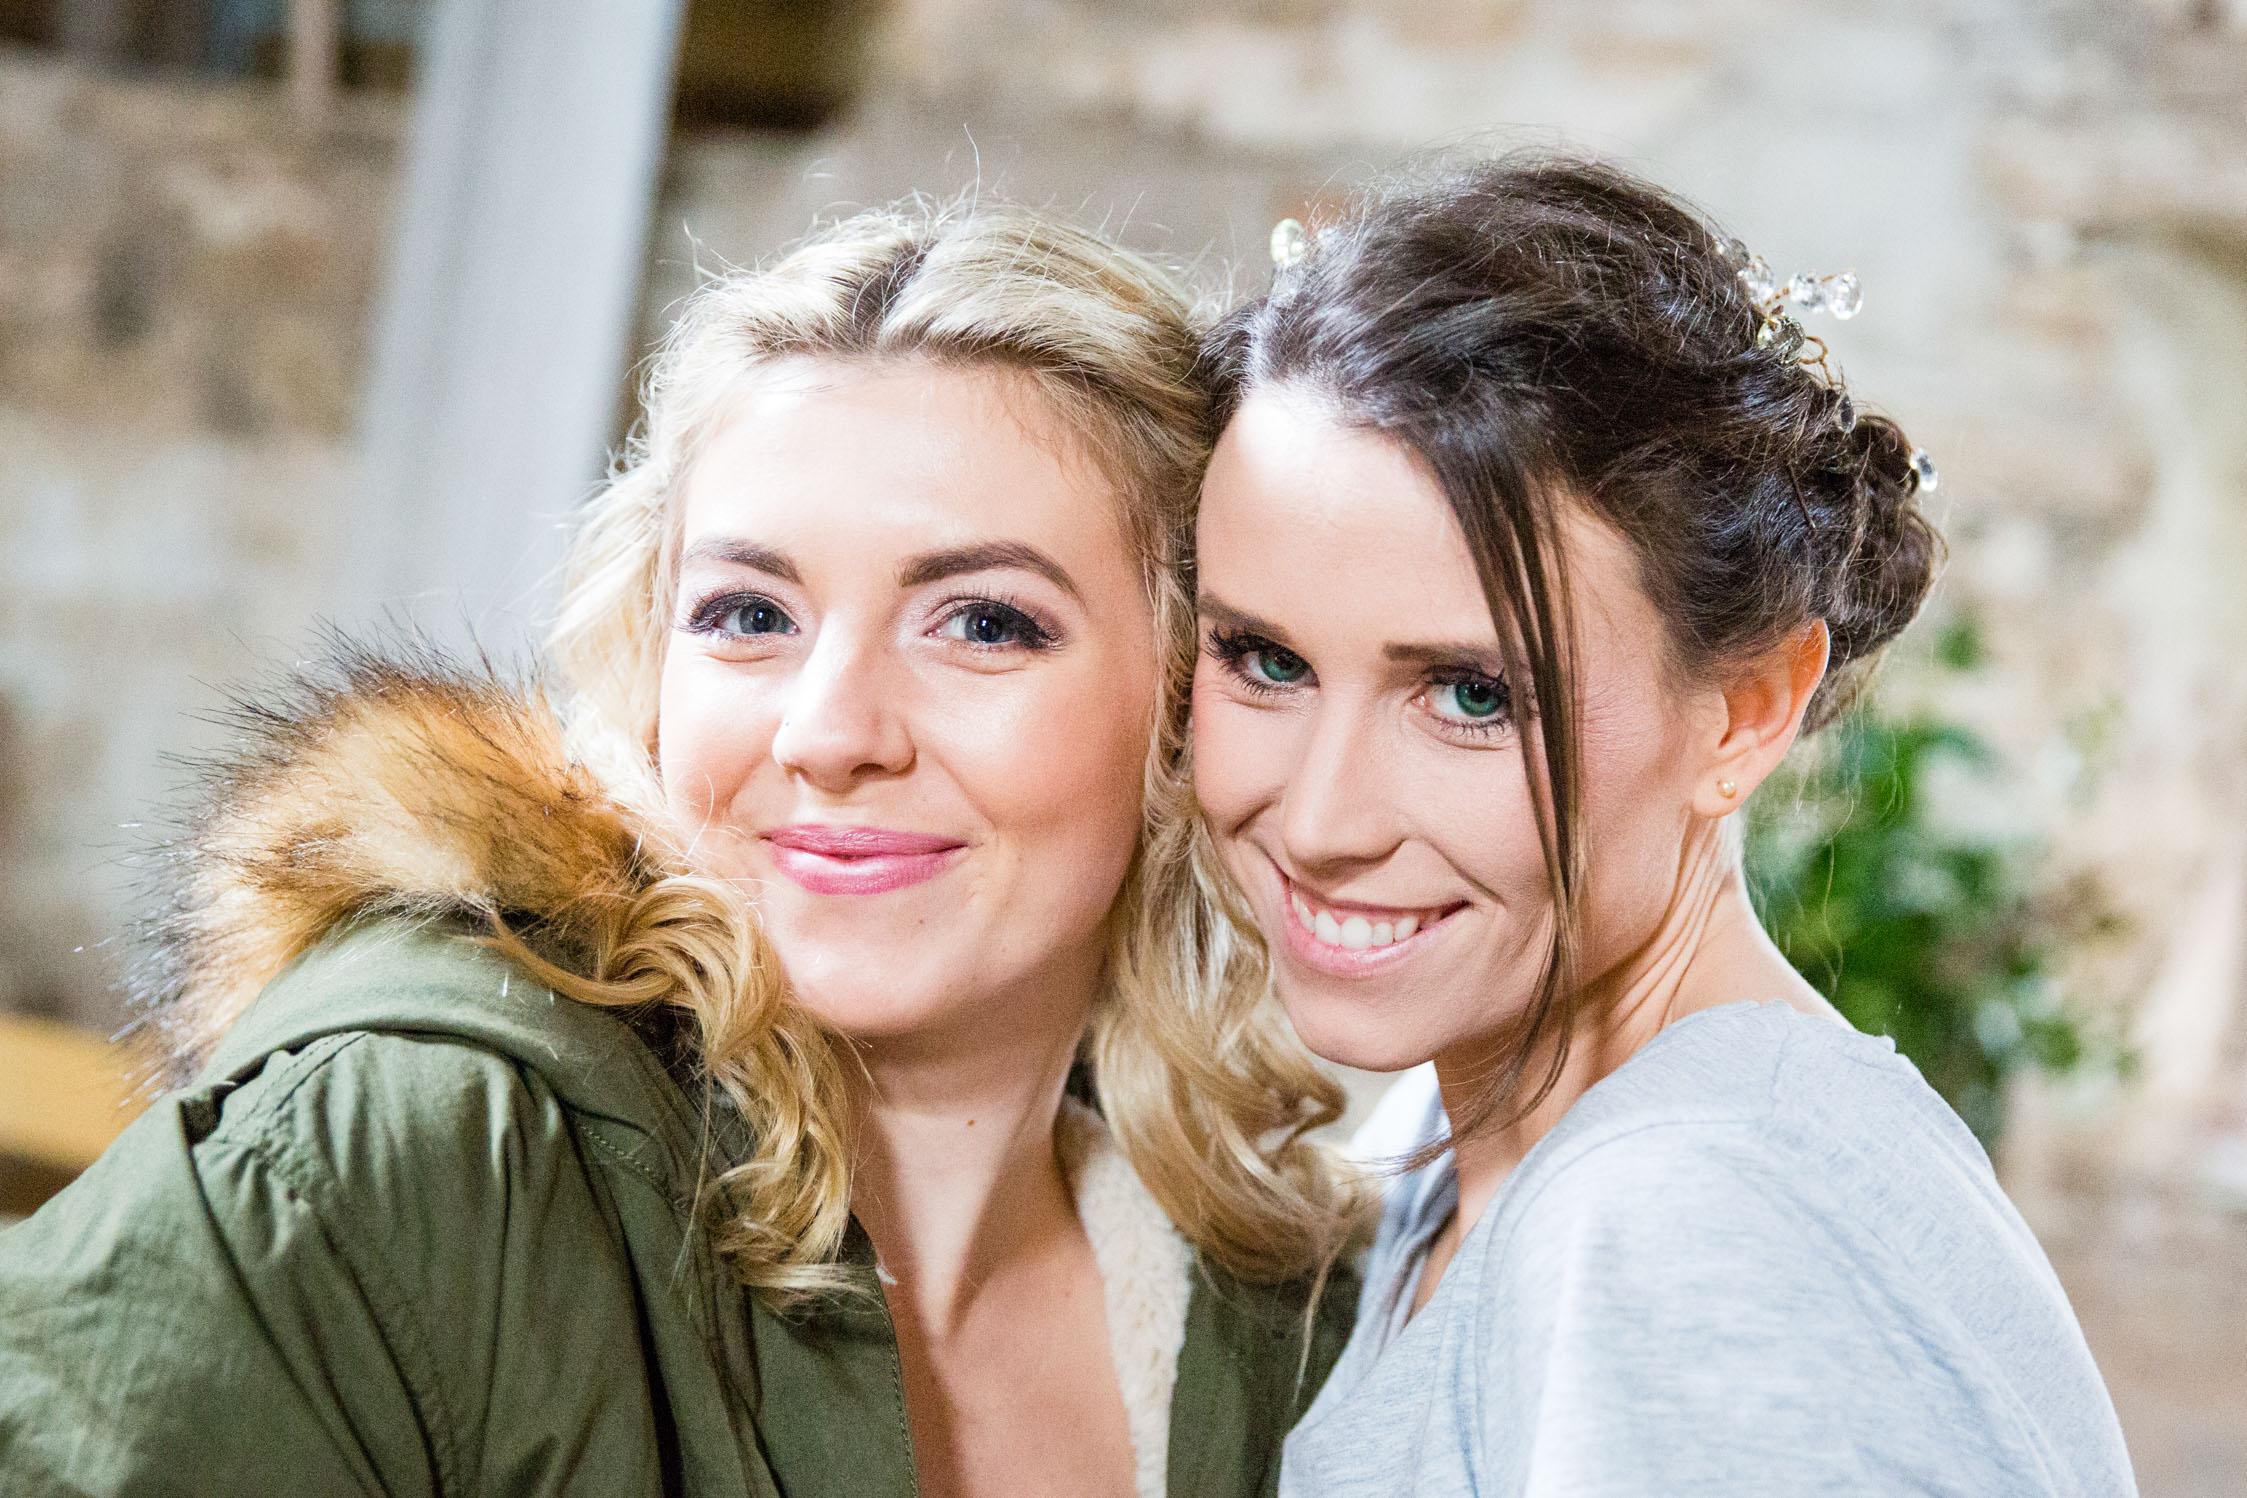 Jess & Ben - Bristol Wedding Photographer - Wright Wedding Photography - 29